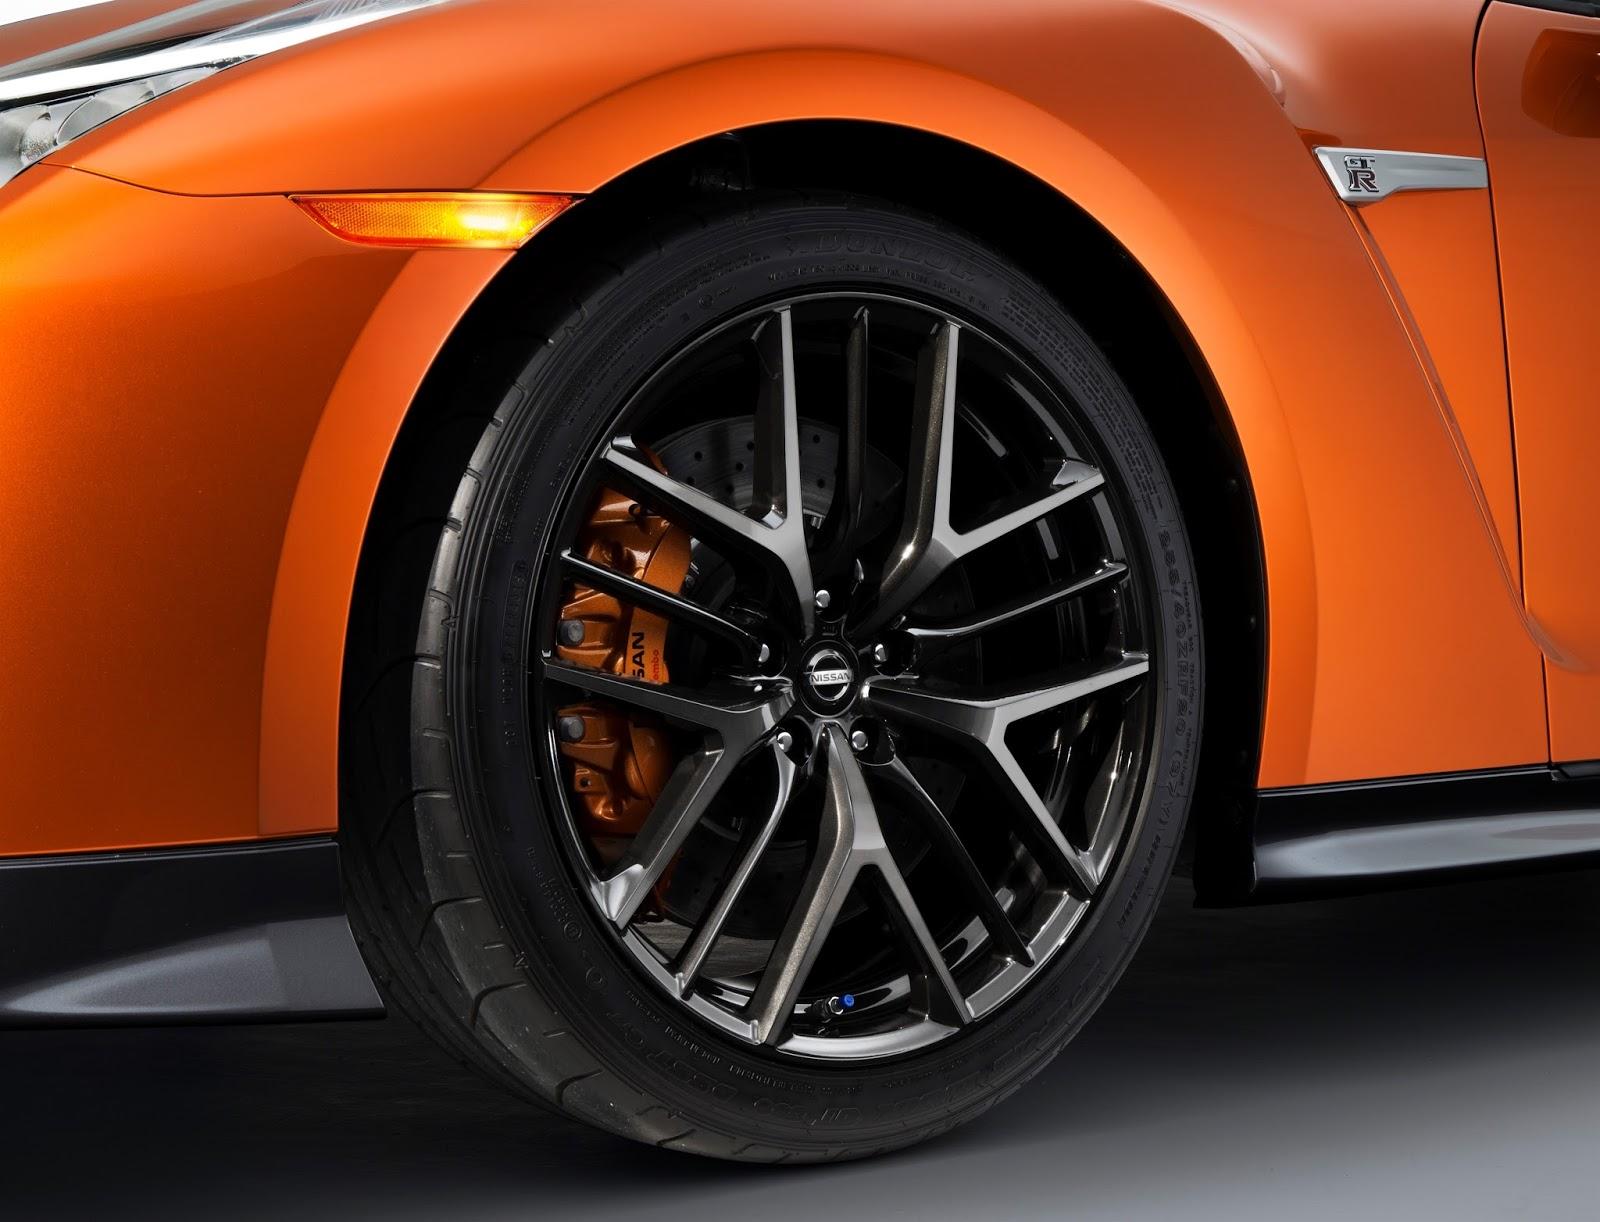 144069 1 5 Nissan GT-R: Ο Godzilla επέστρεψε! Godzilla, Nissan, Nissan GT-R, supercars, έκθεση Νέας Υόρκης